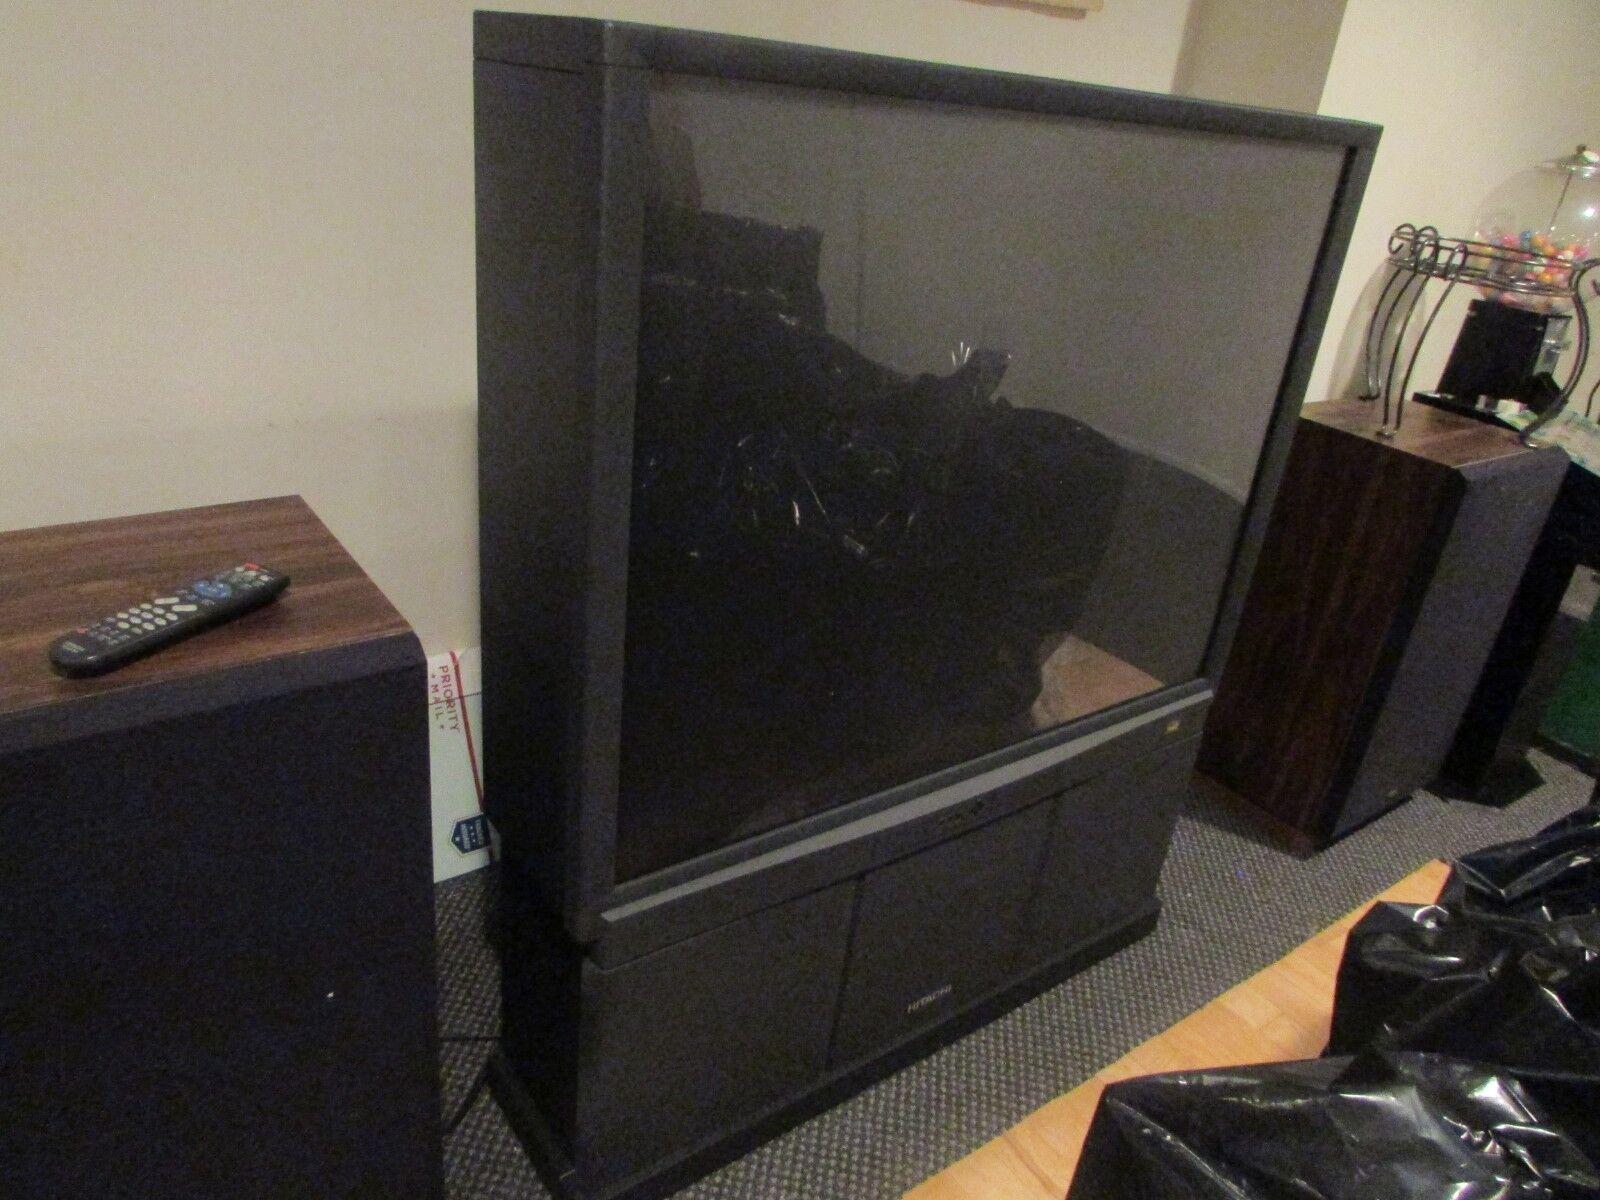 "HITACHI WIDE SCREEN PROJECTION TV MODEL 50GX30B  SCREEN 30 X 40"" BLACK REMOTE"